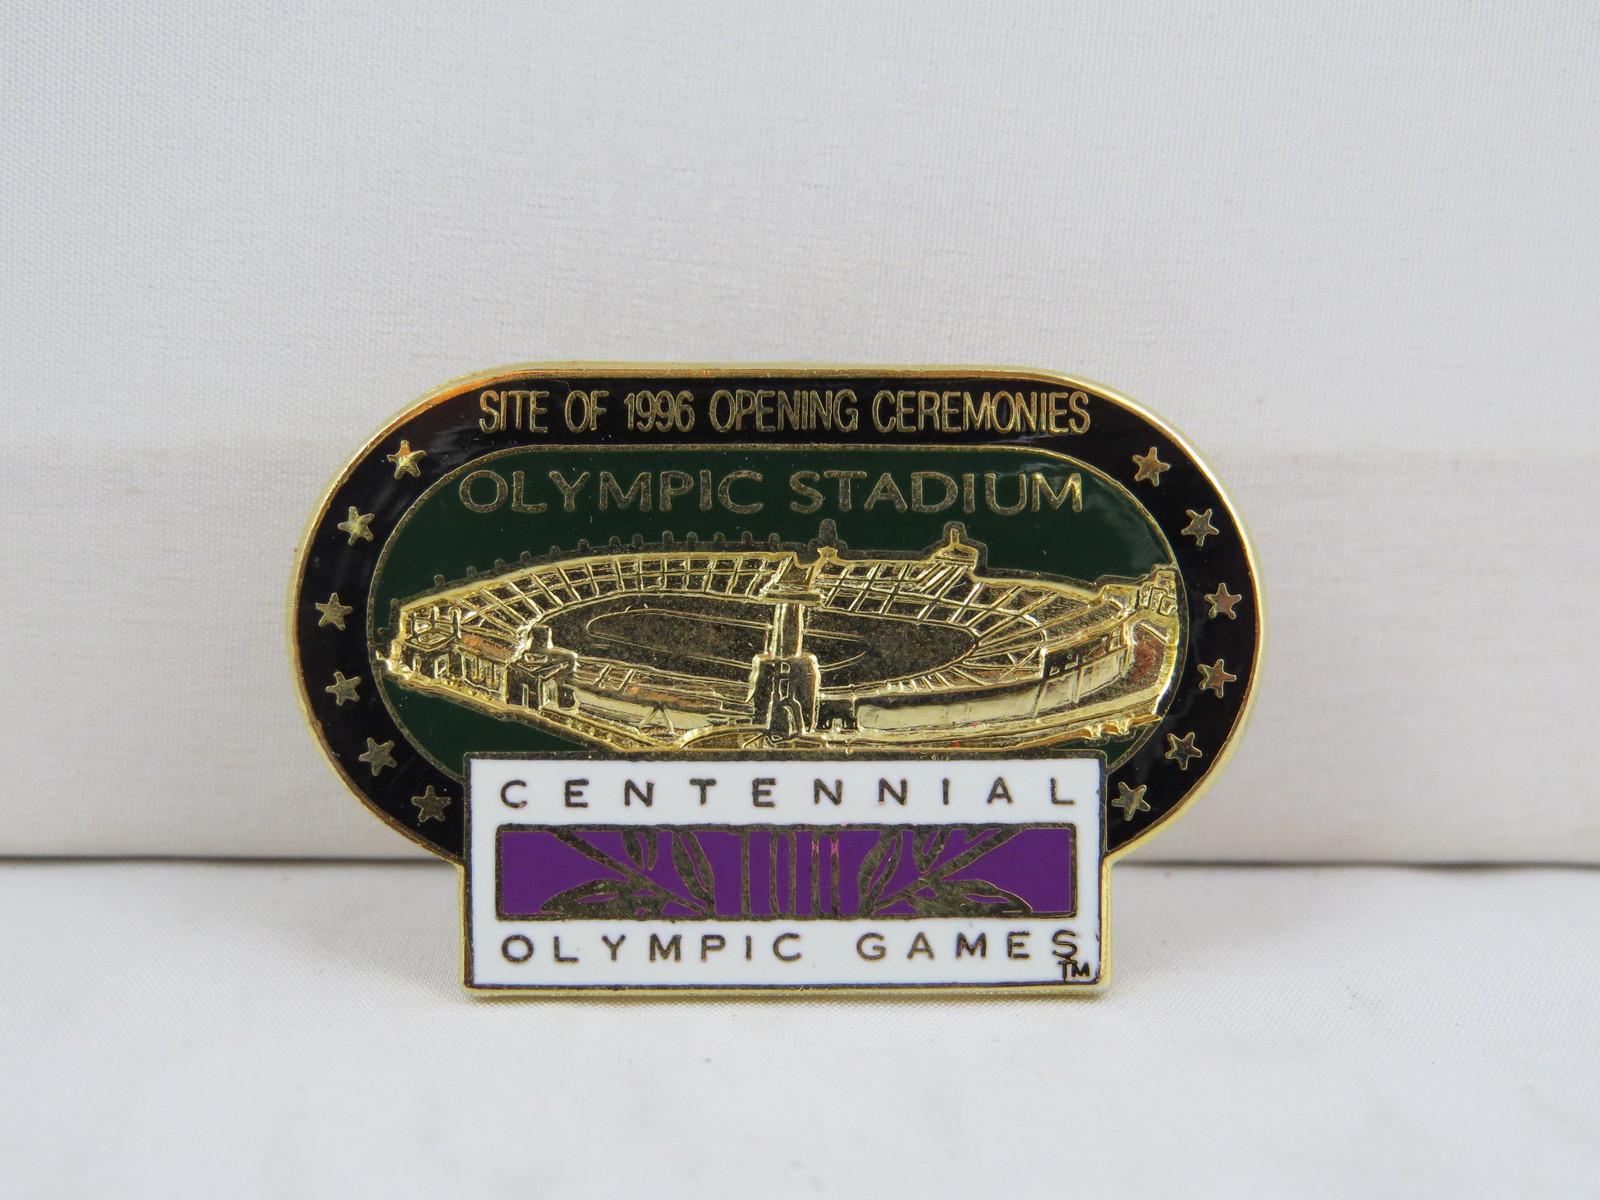 1996 Summer Olympic Games Pin- Centeninial Stadium Atlanta - Amazing Design - $25.00